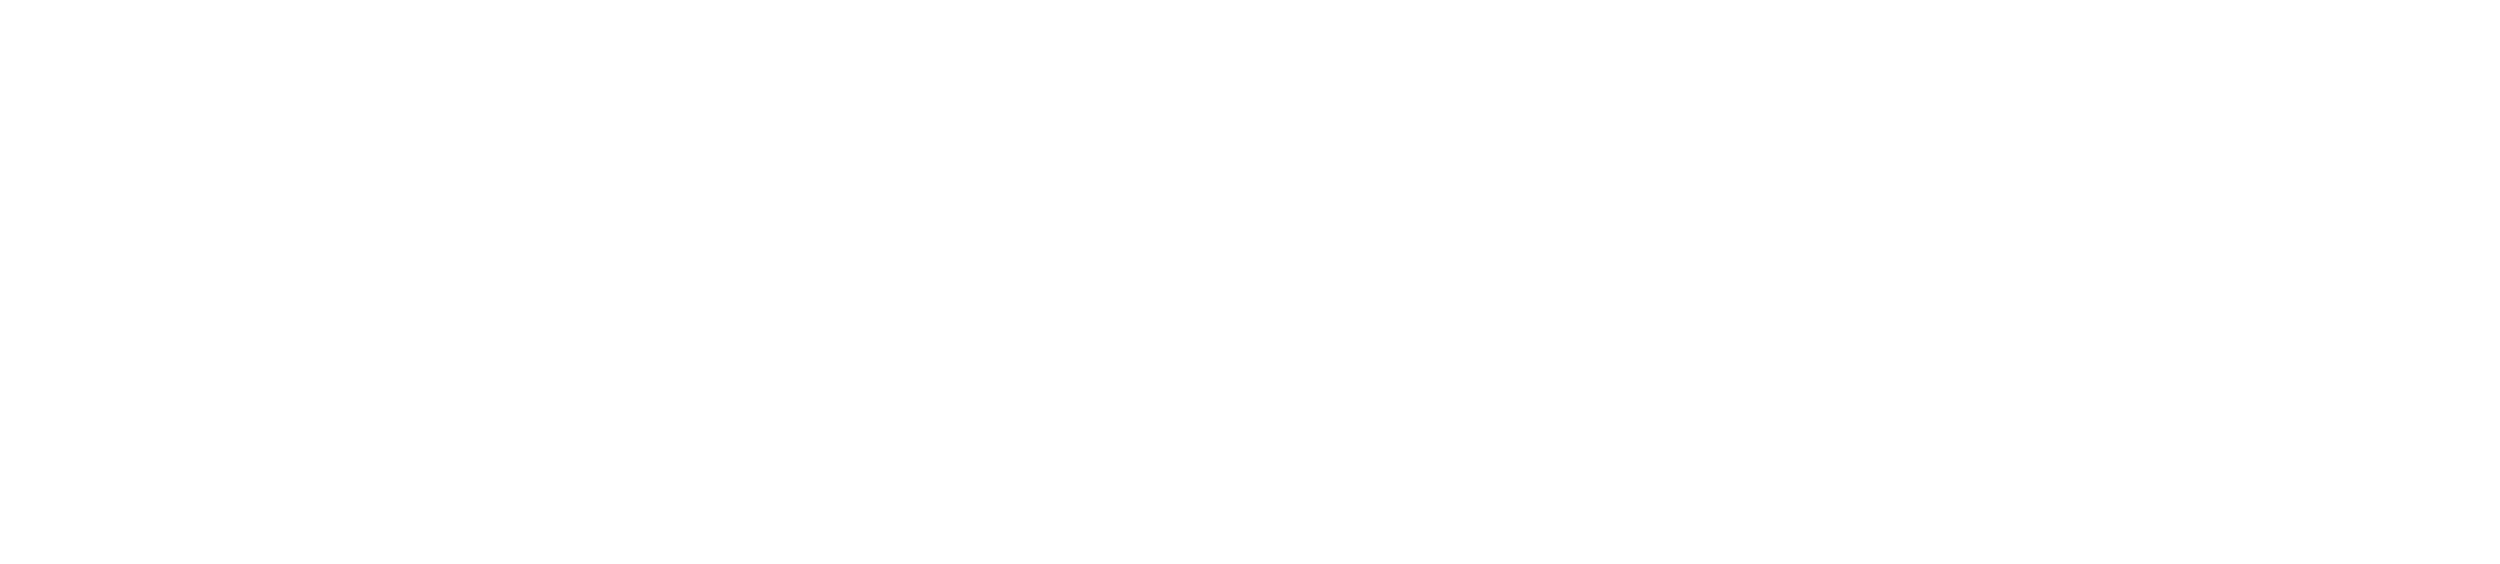 illuminateChurch_white_logo.png